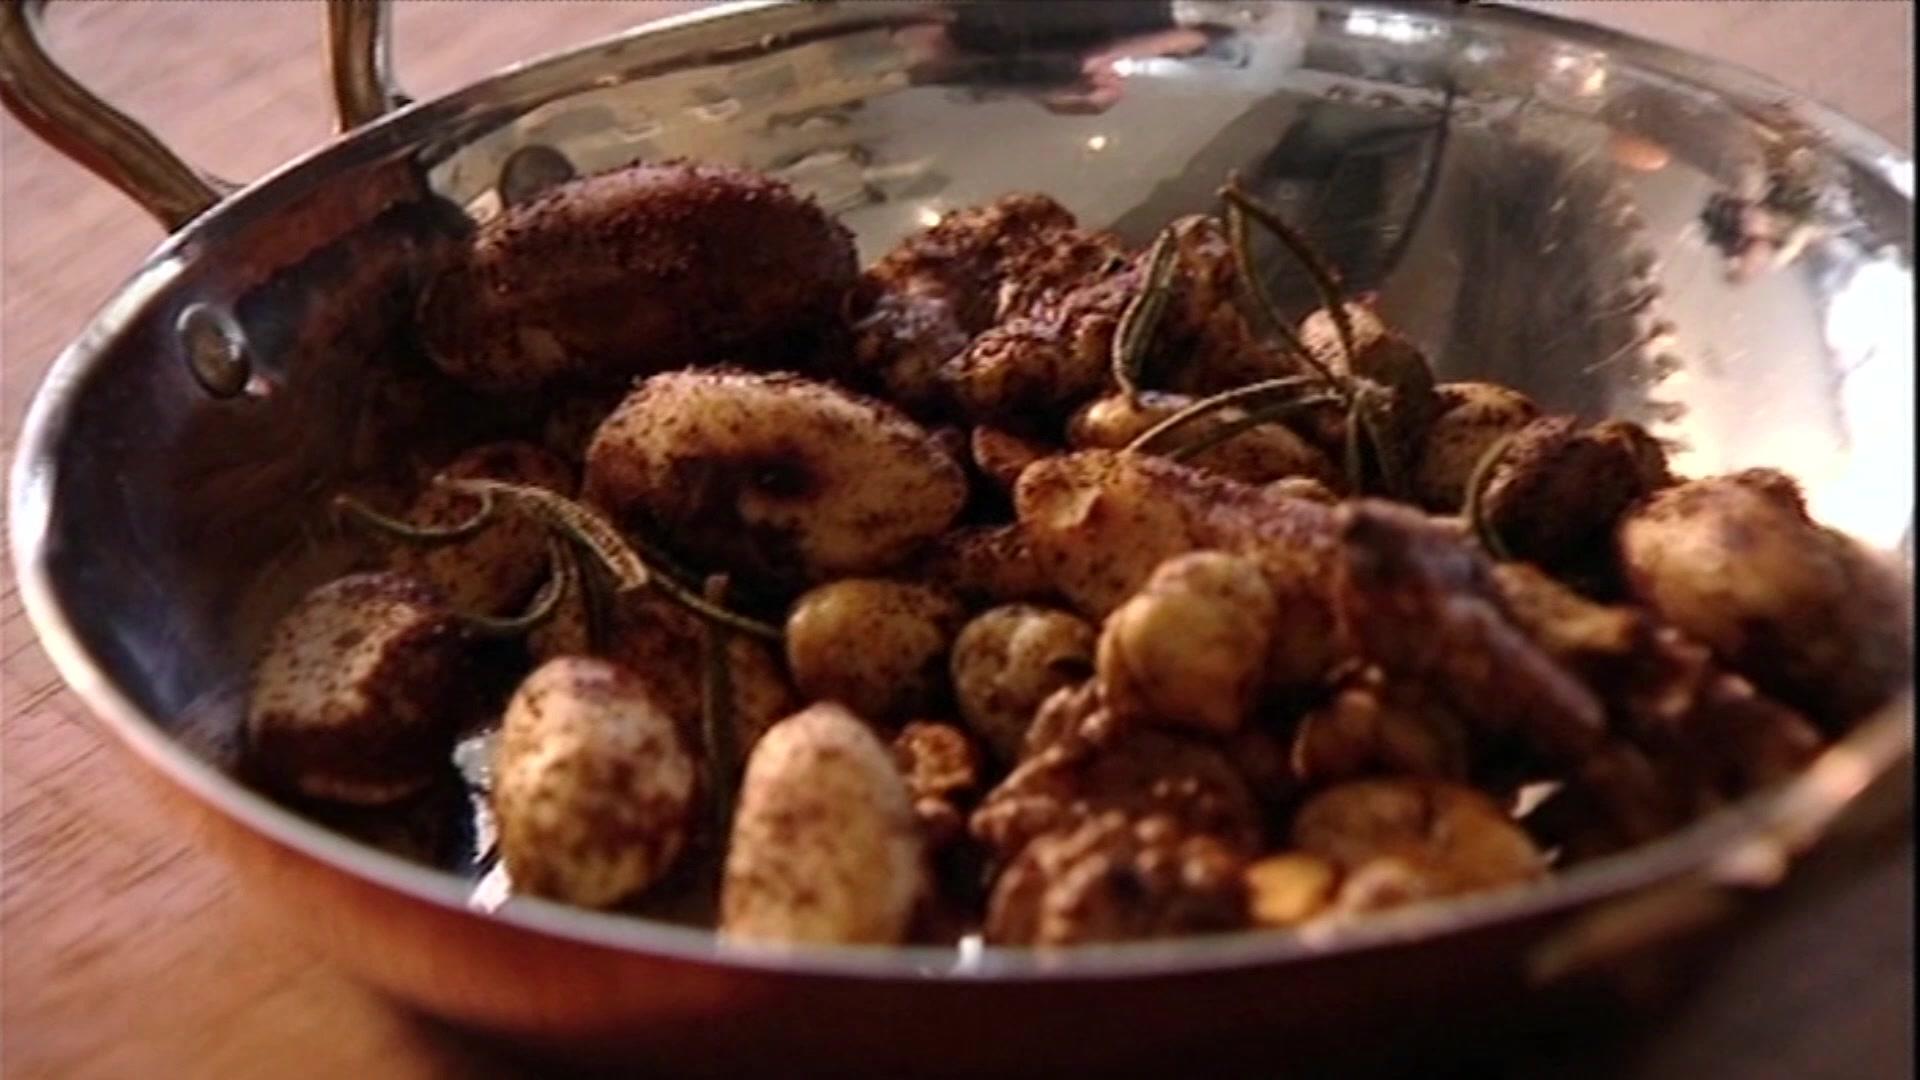 Spiced Roasted Nuts Recipe - Gordon Ramsay